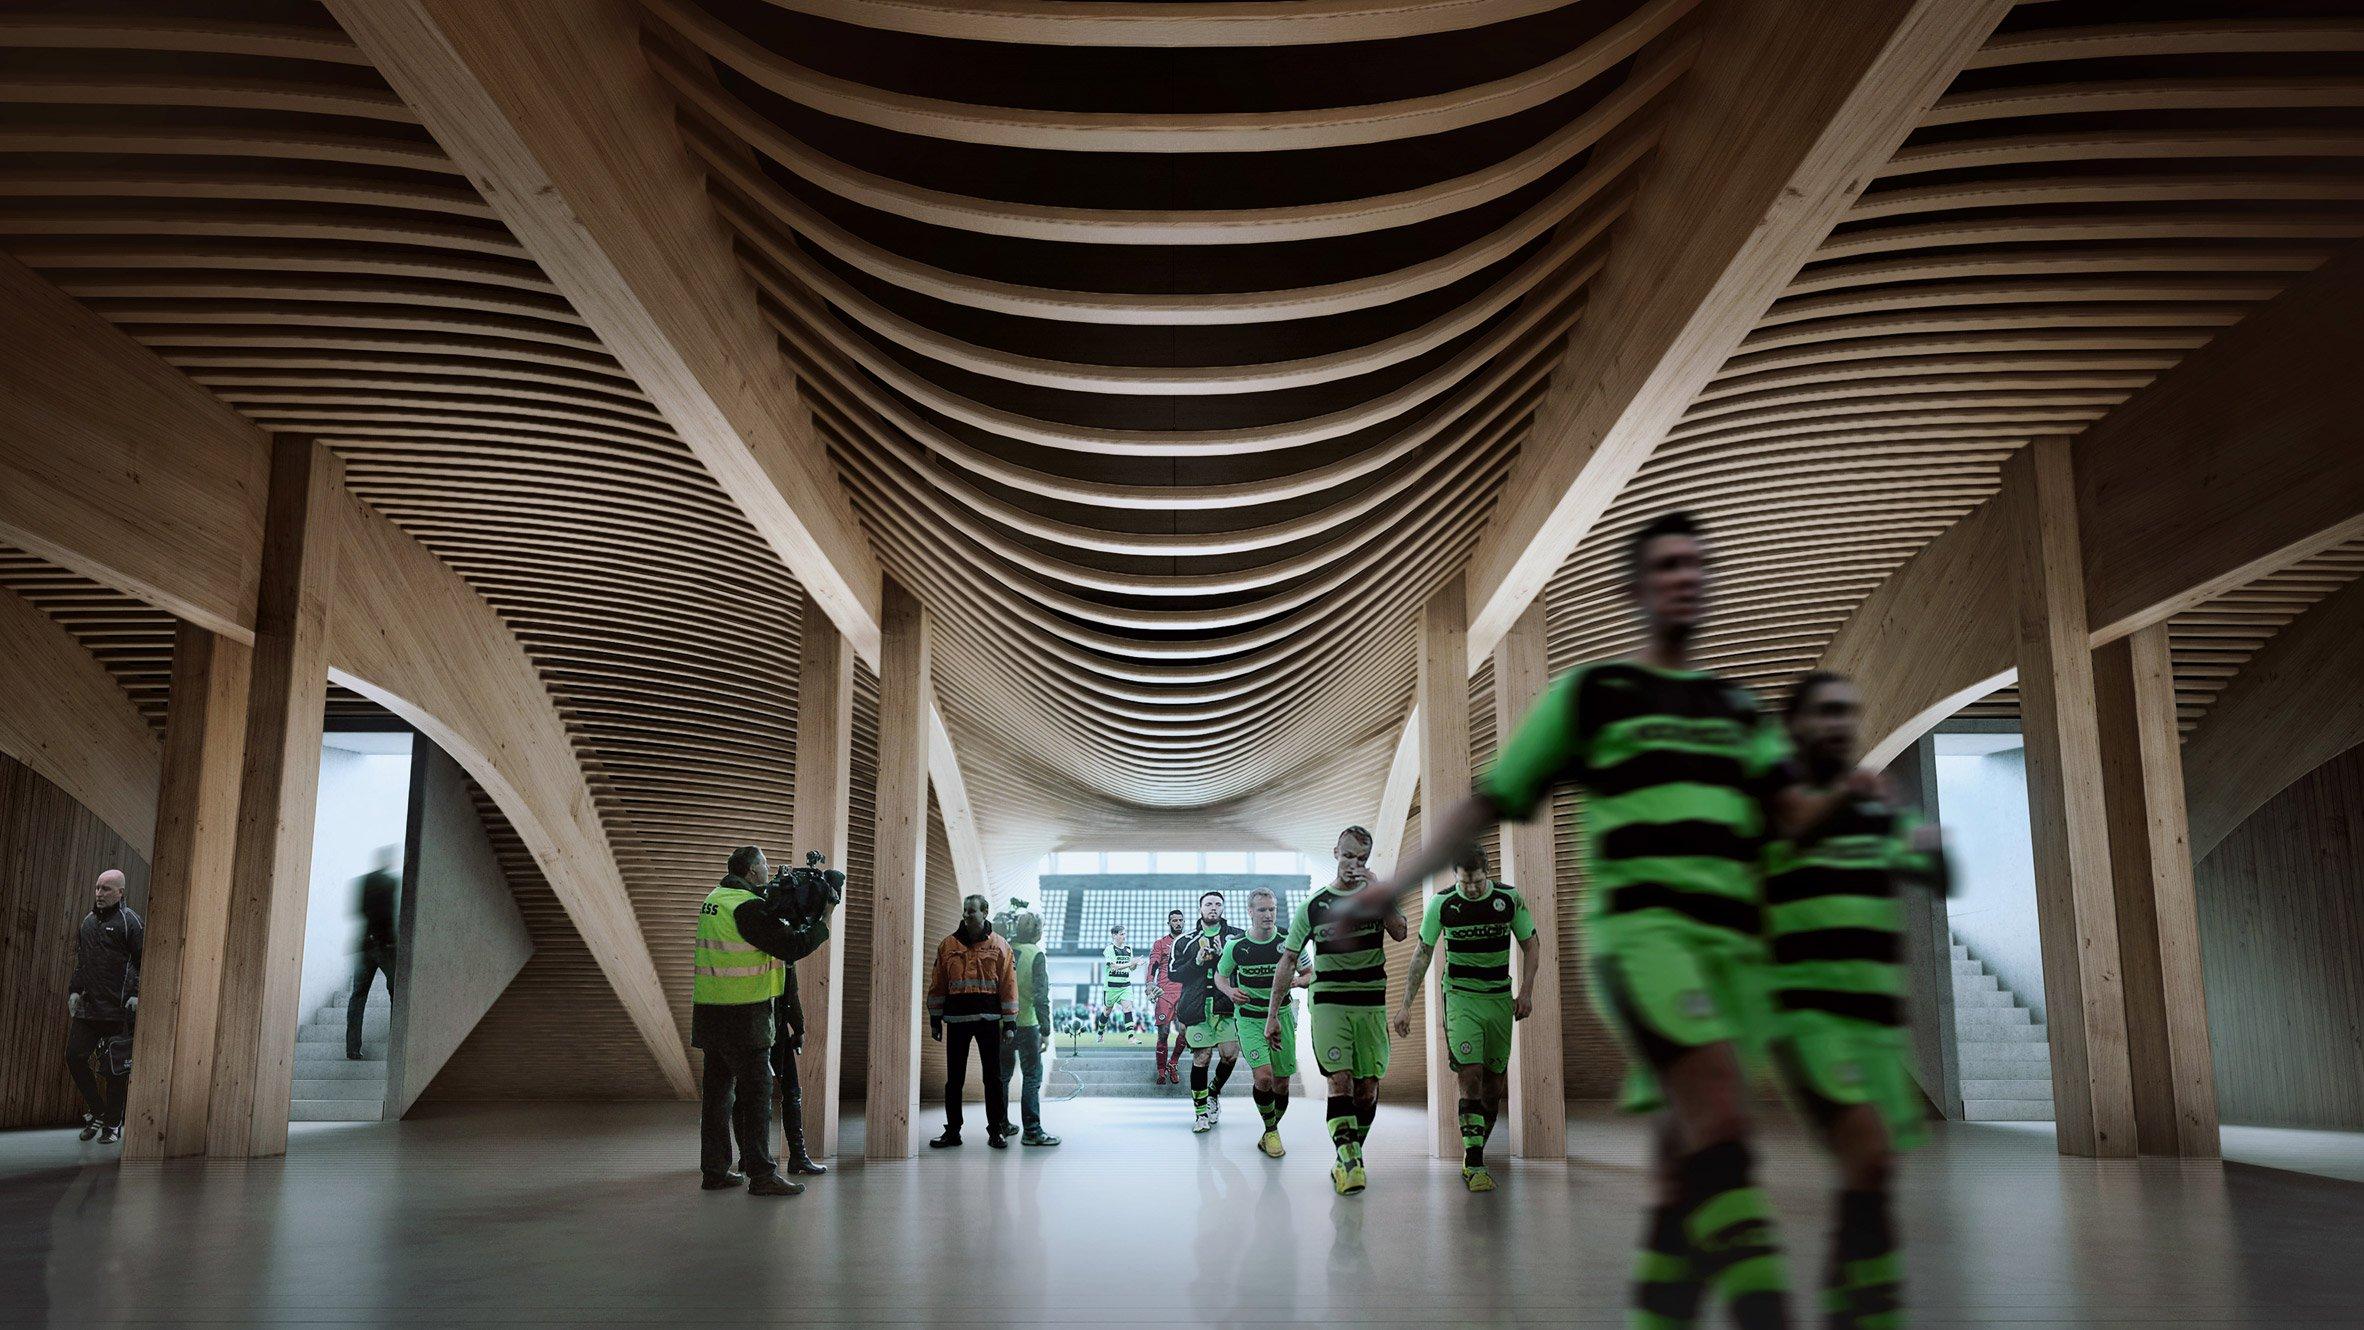 forest-green-rovers-eco-park-football-soccer-stadium-architecture-news-zaha-hadid-architects-stroud-gloucestershire-england-uk_dezeen_2364_col_3